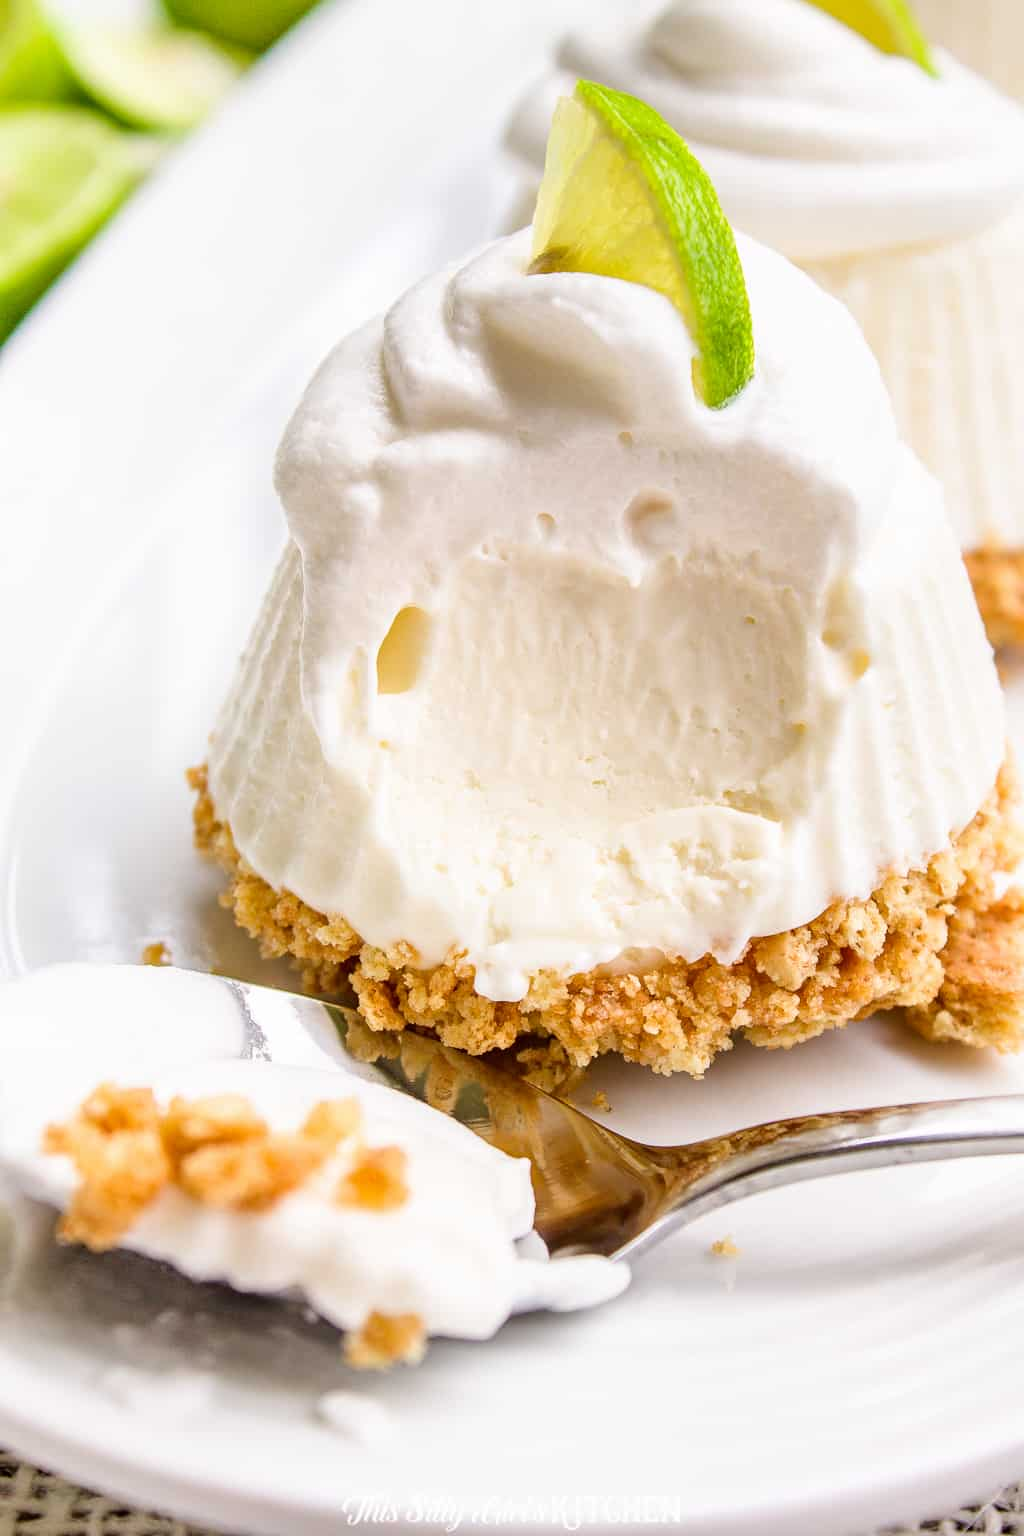 Key Lime Pie, cute little no-bake pies that will have your family raving for more! #recipe from thissillygirlskitchen.com #keylimepie #individualfrozenkeylimepie #keylime #summer #dessert #frozen #minikeylimepie